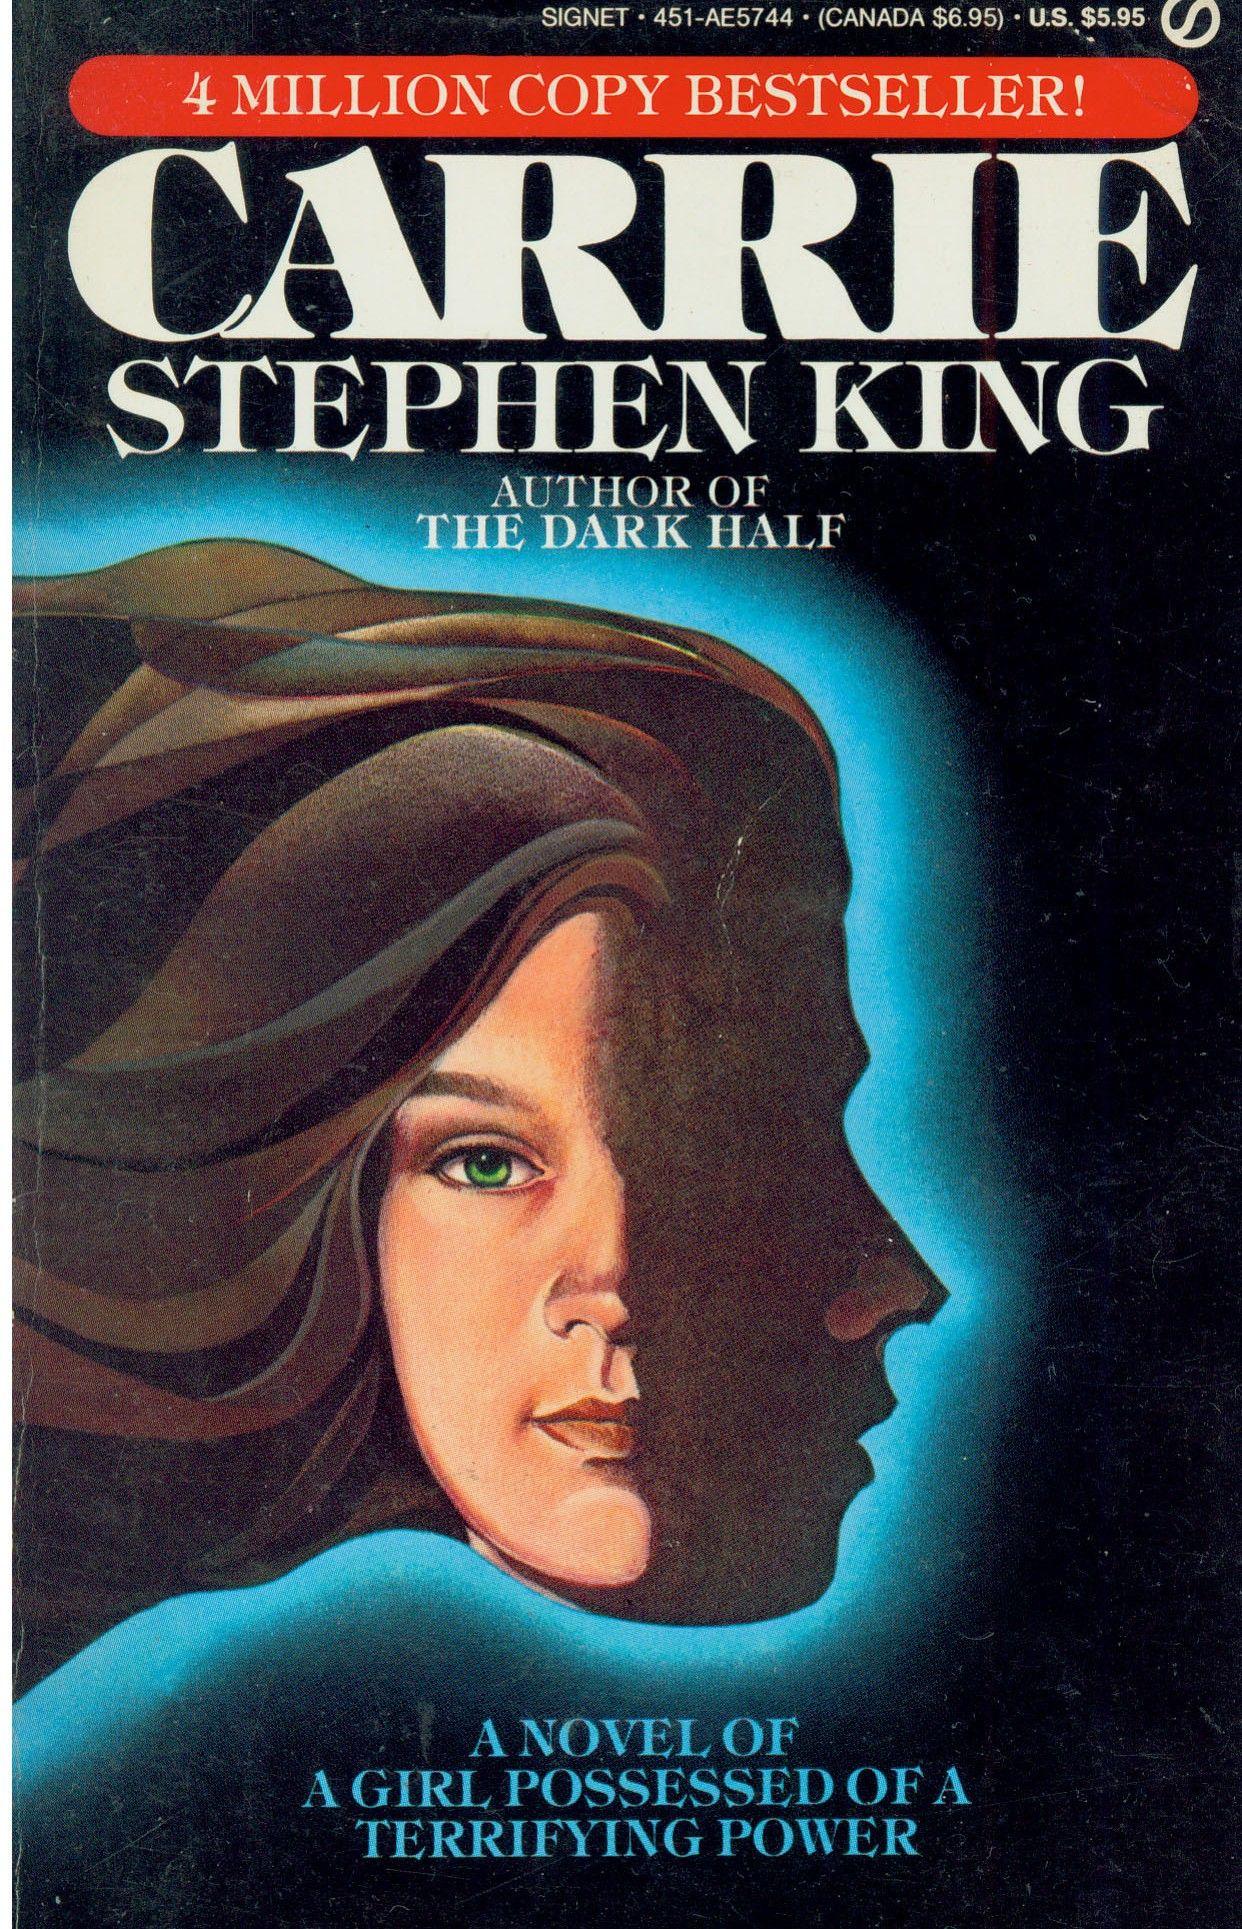 Stephen King will envy the nightmarish stories of real killer clowns 90